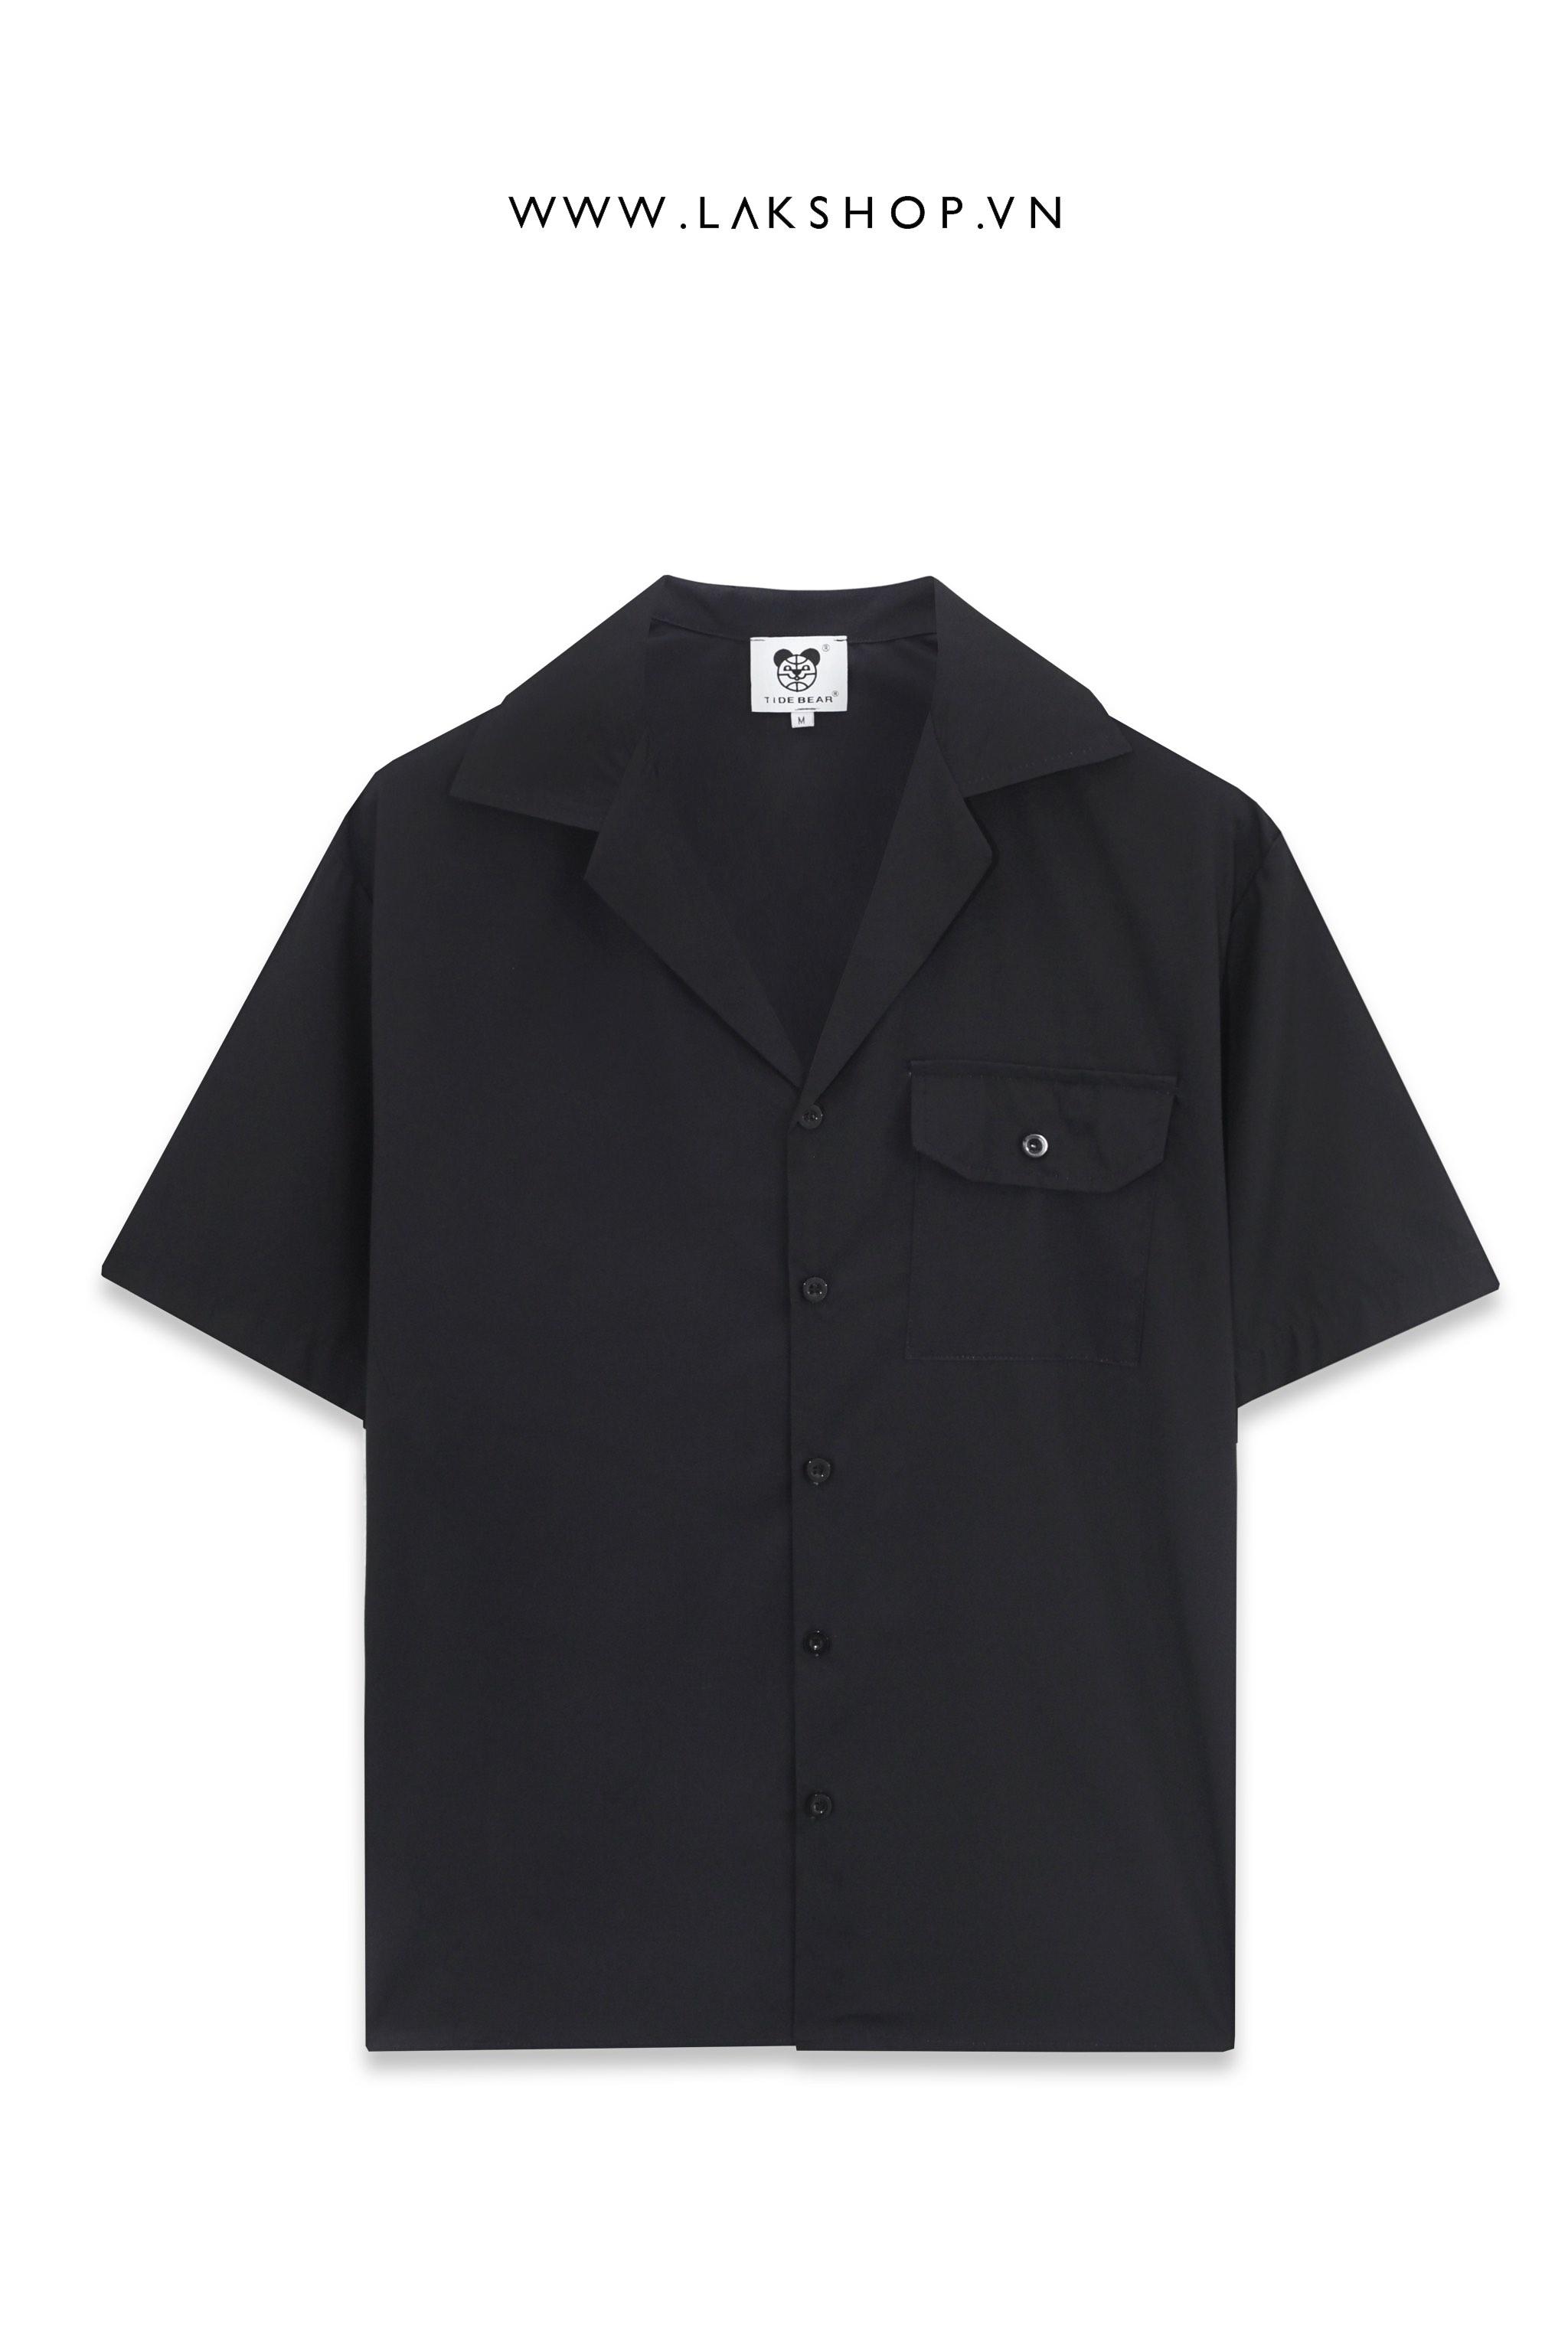 SpongeBob Print Short Sleeve Shirt cv3